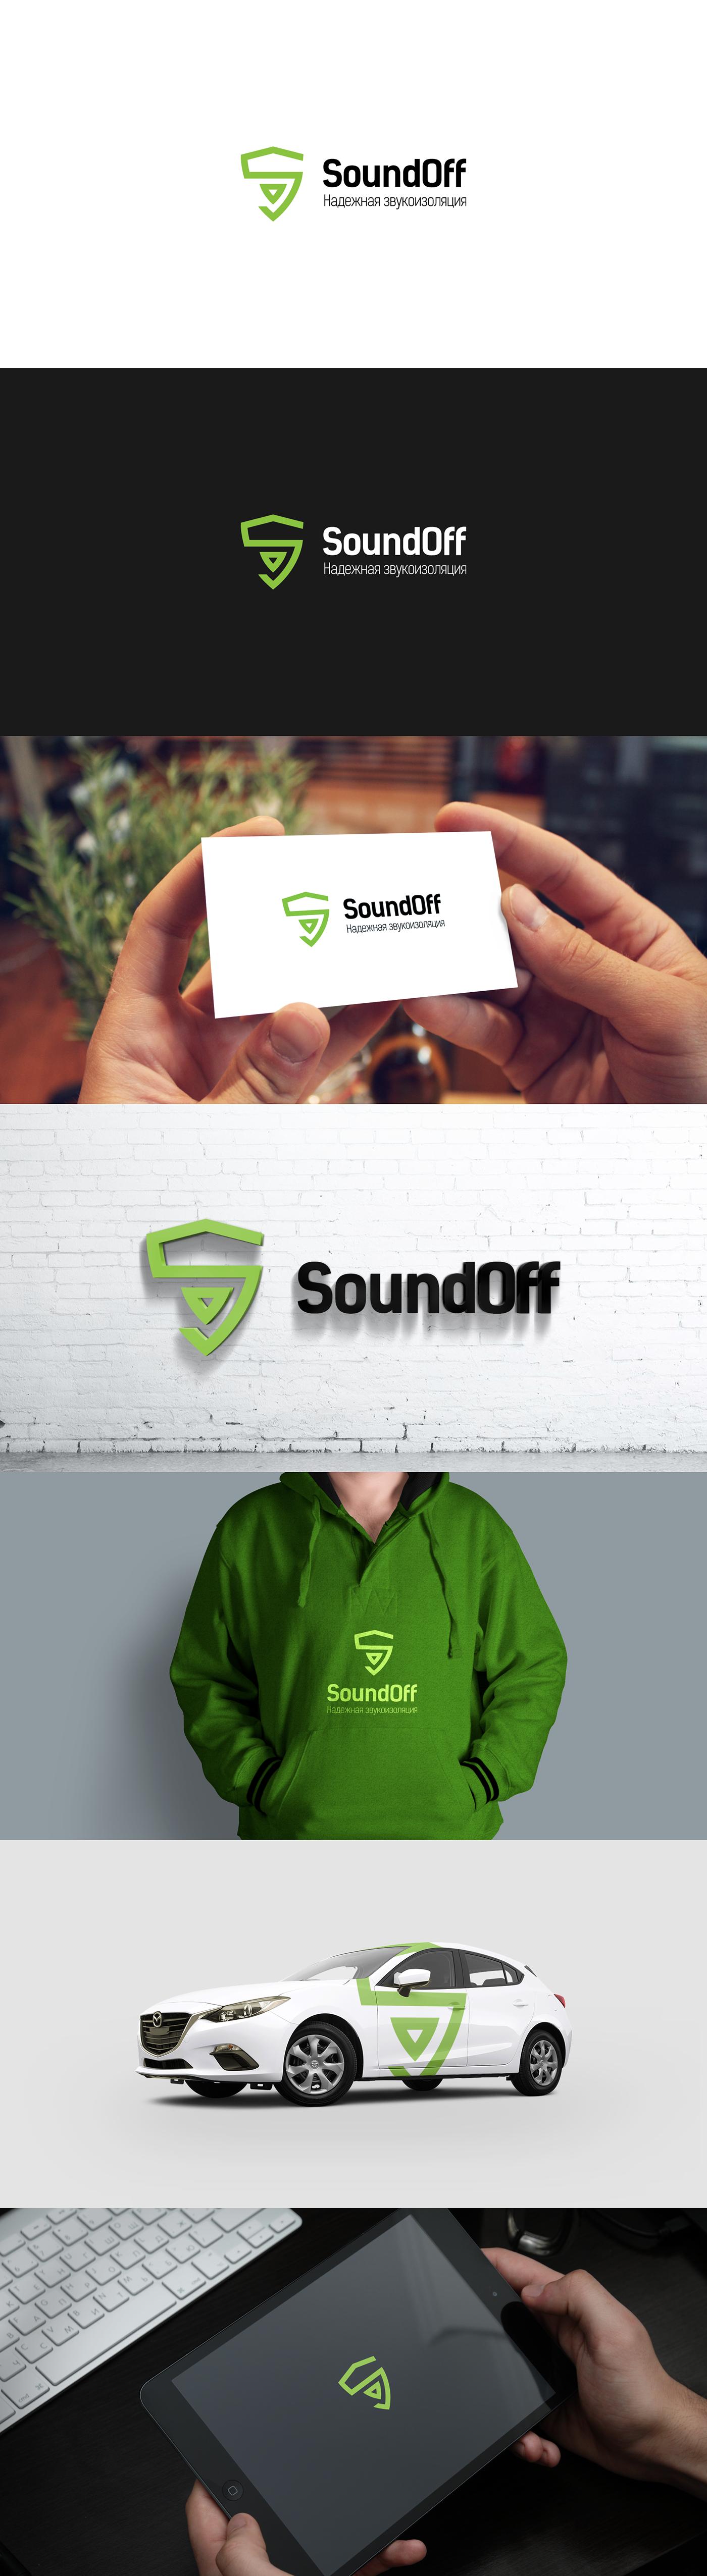 naming sound Logotype logo SoundOff soundguard identity green ecological trust